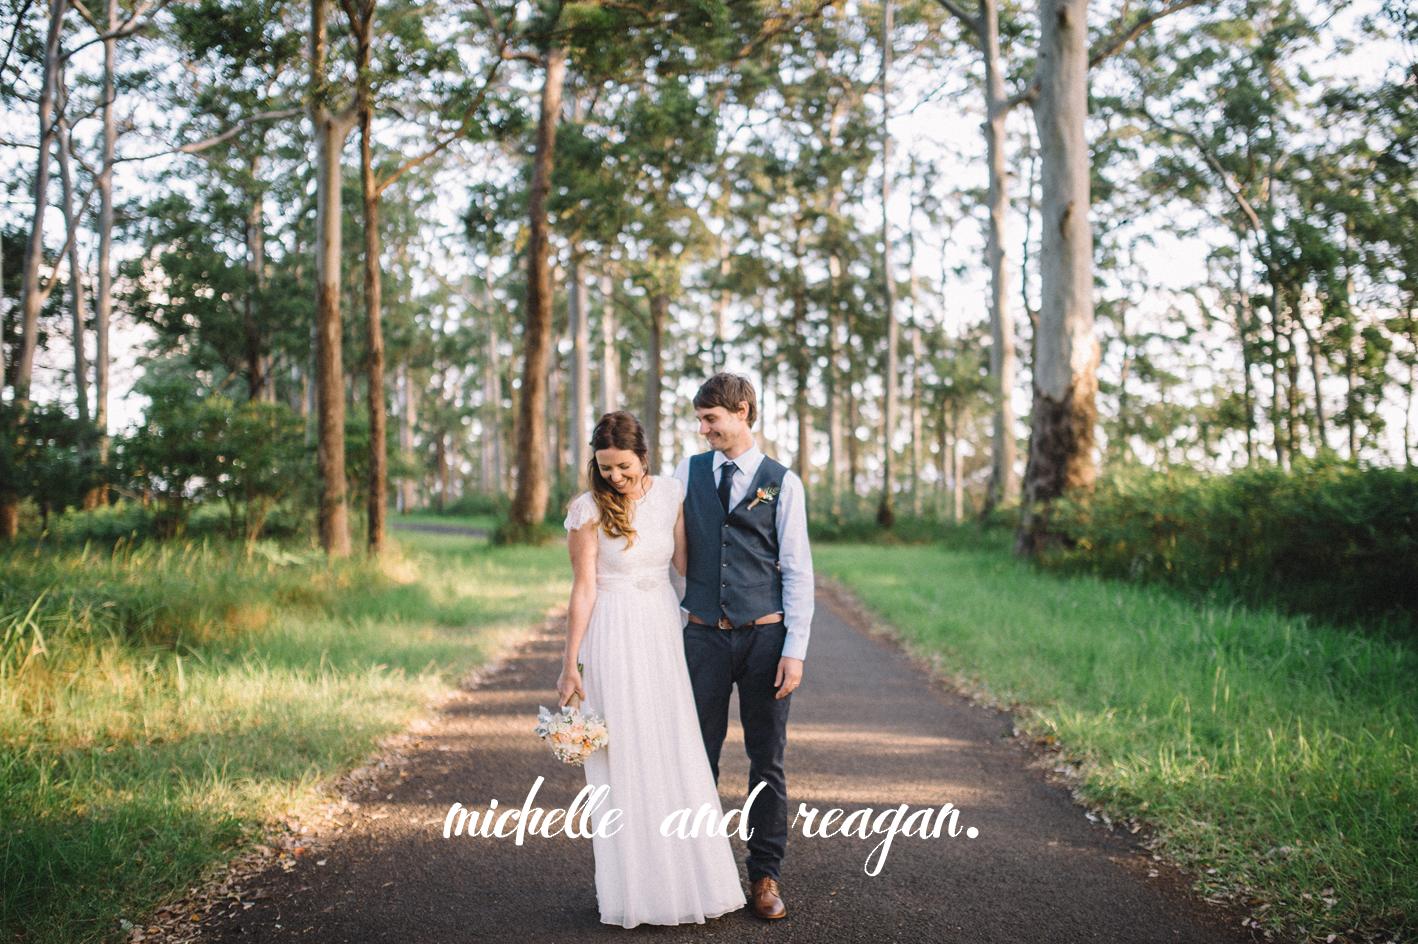 001-michelle-reagan-mount-tamborine-wedding-sophie-baker-photography